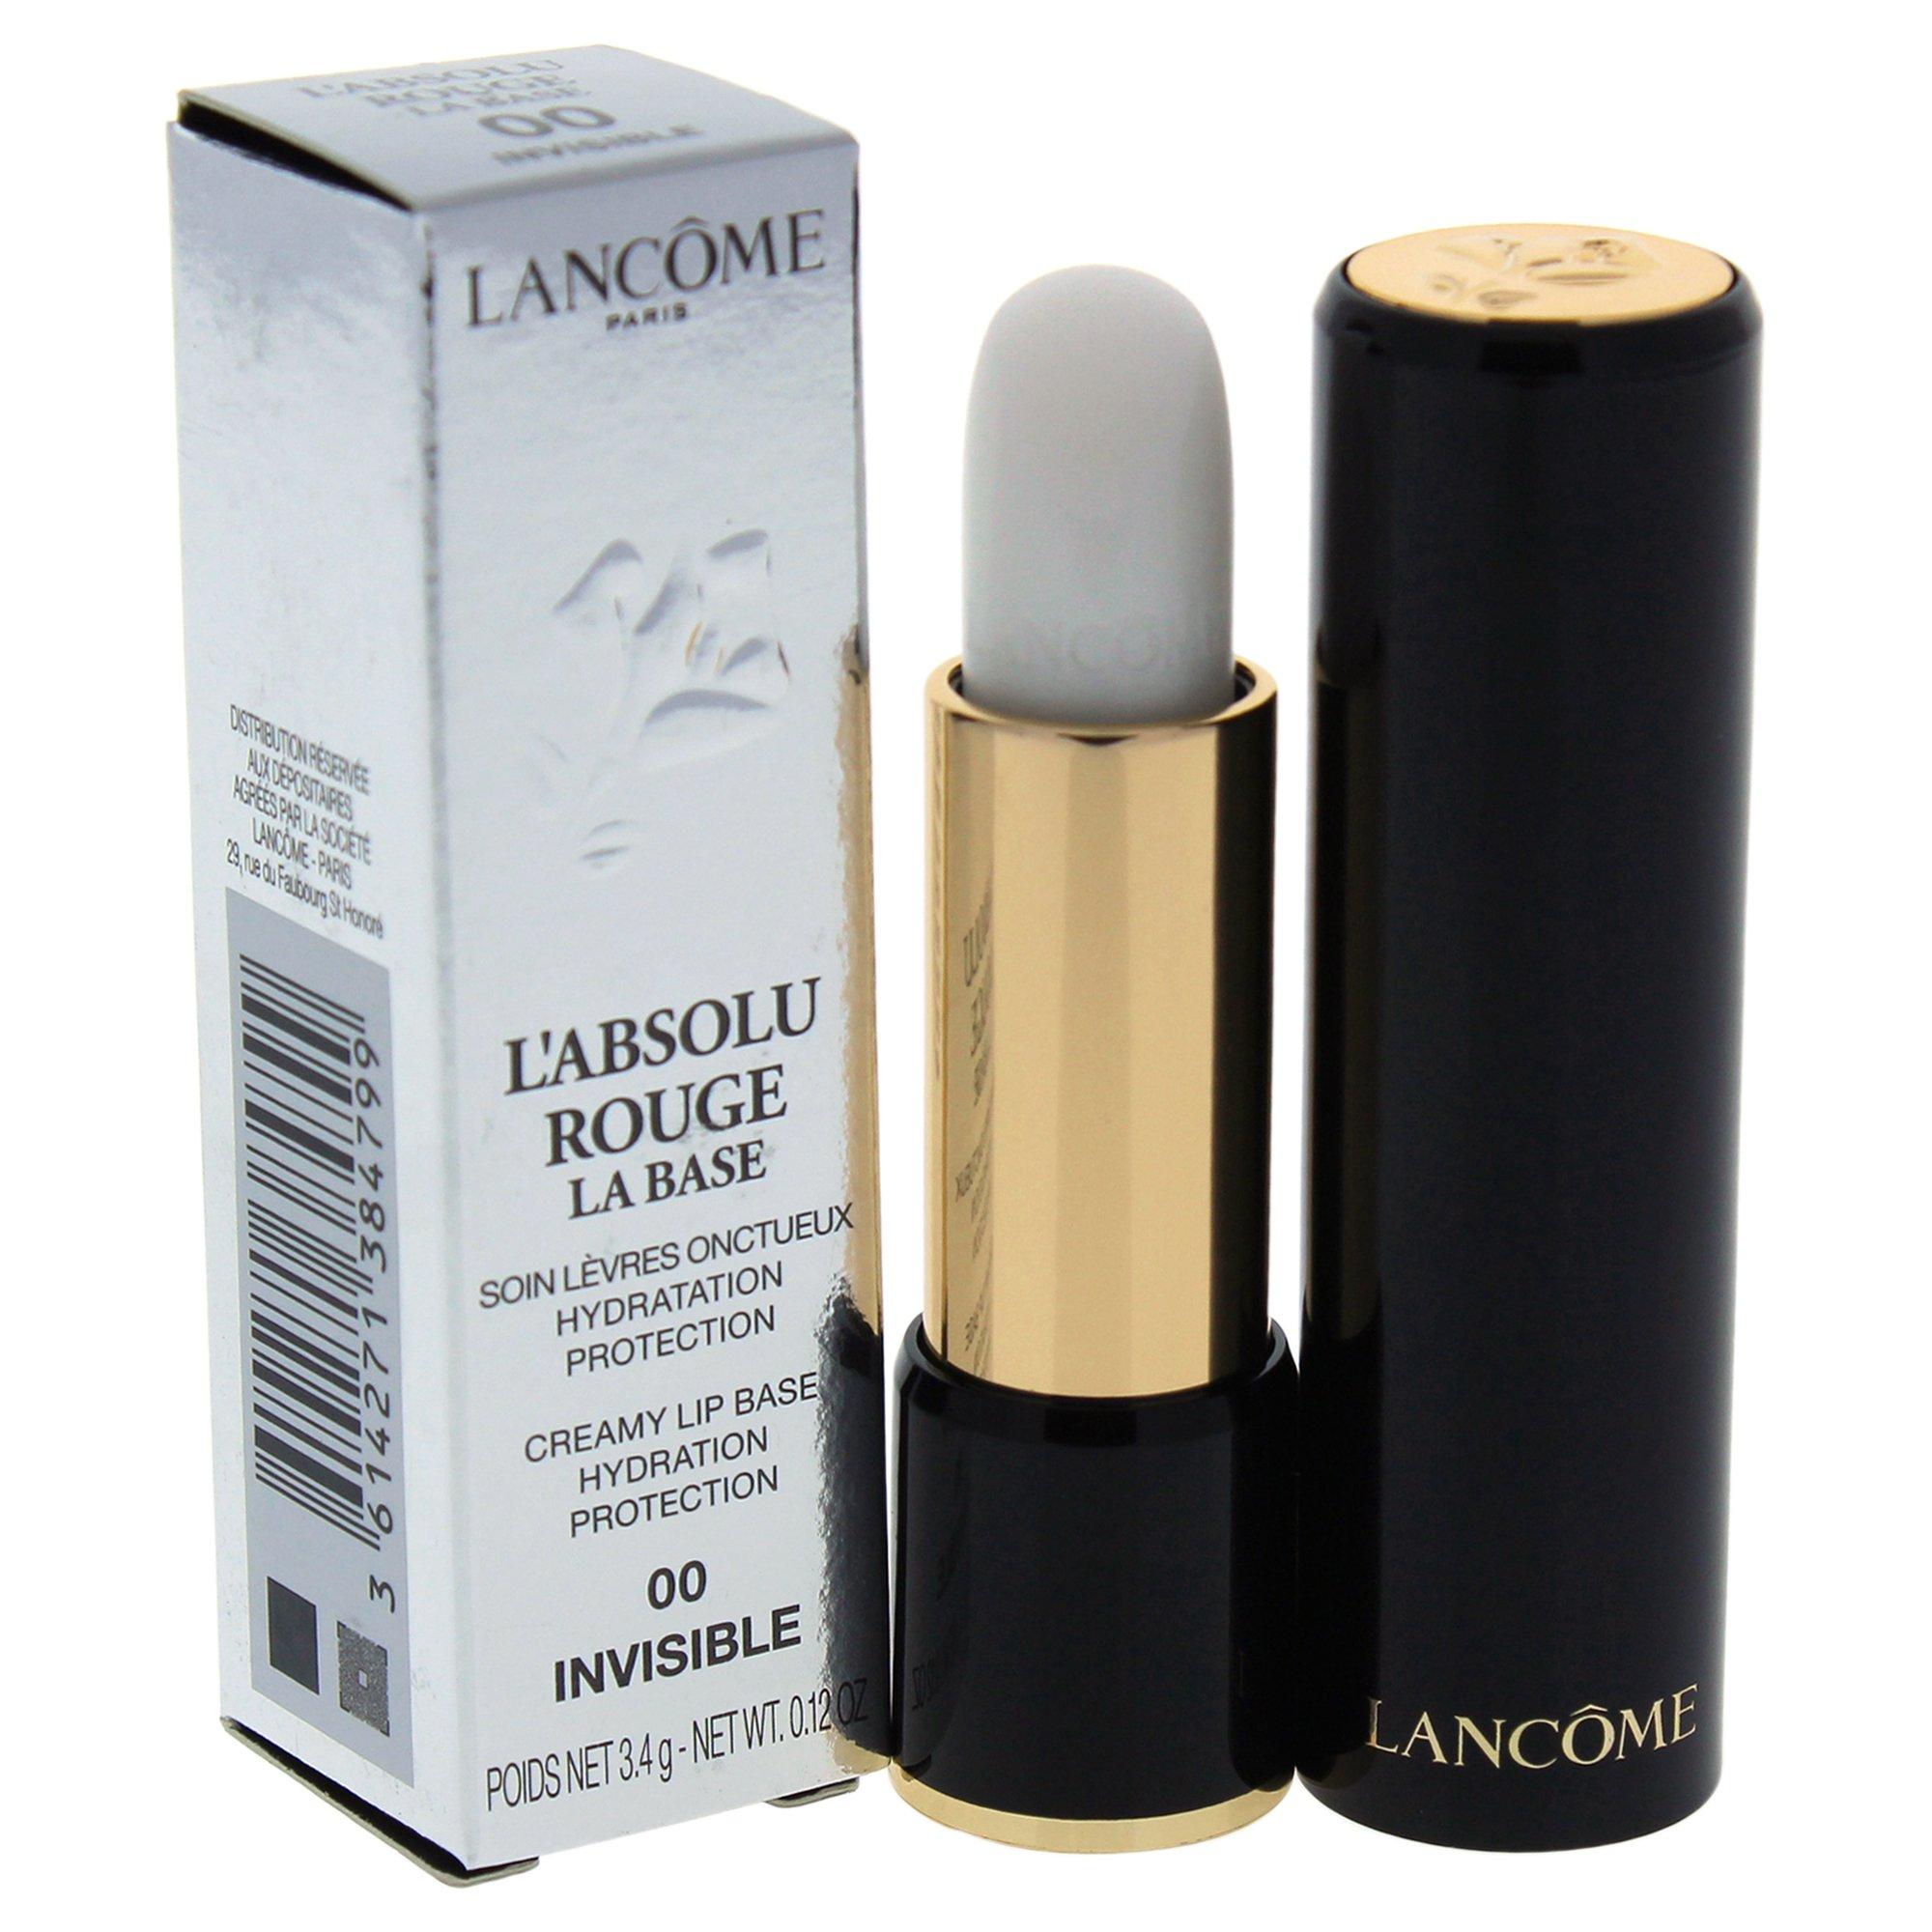 Lancome L' Absolu Rouge La Base Creamy Lip Base, No. 00 Invisible, 0.12 Ounce